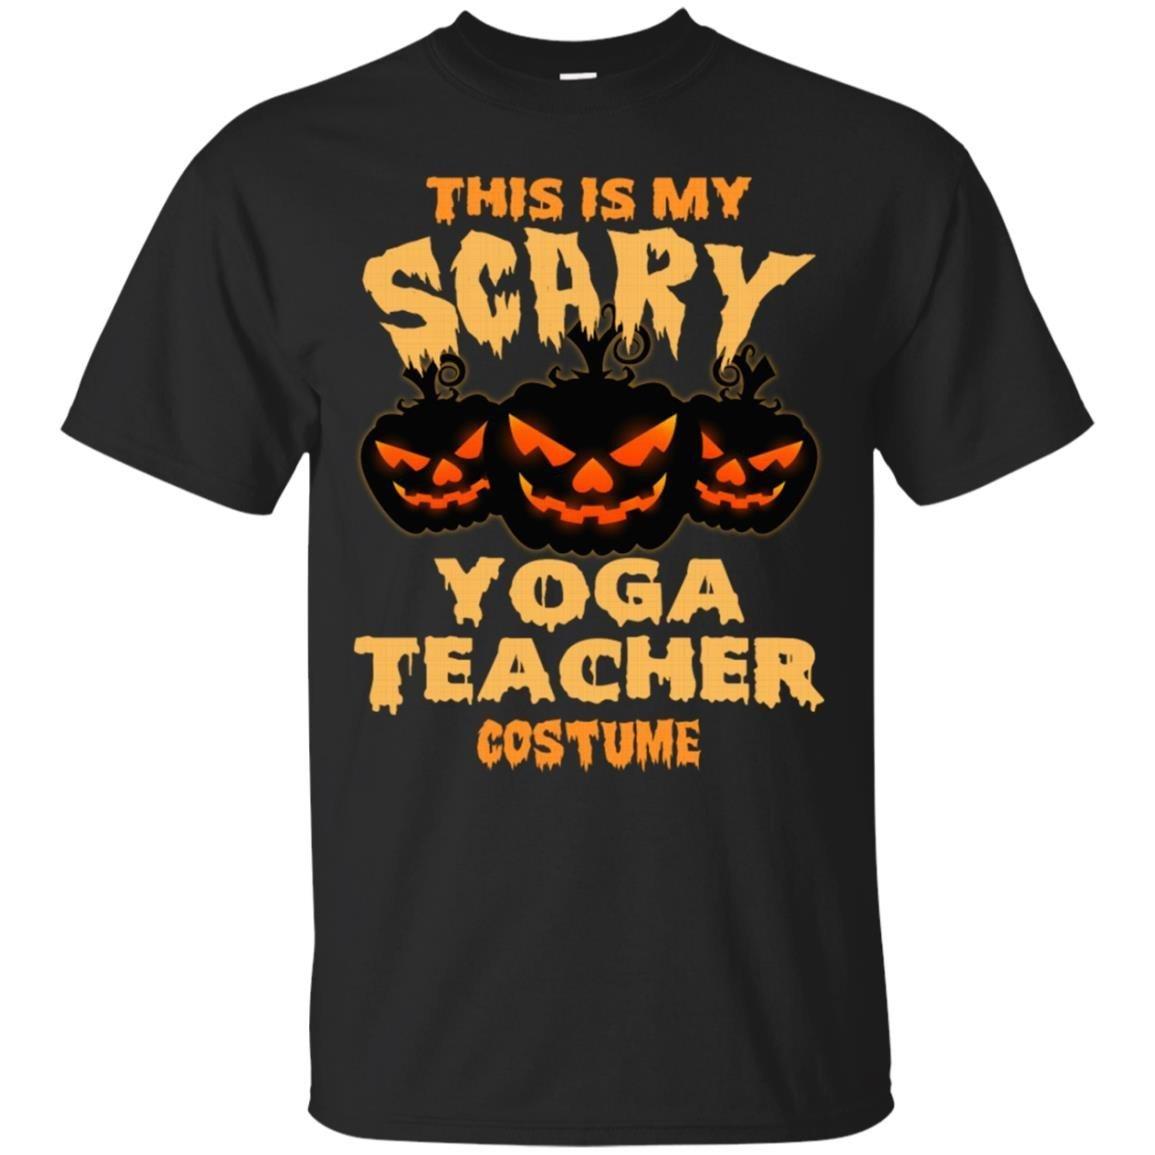 Yoga Teacher This Is My Yoga Teacher Costume T-Shirt Men